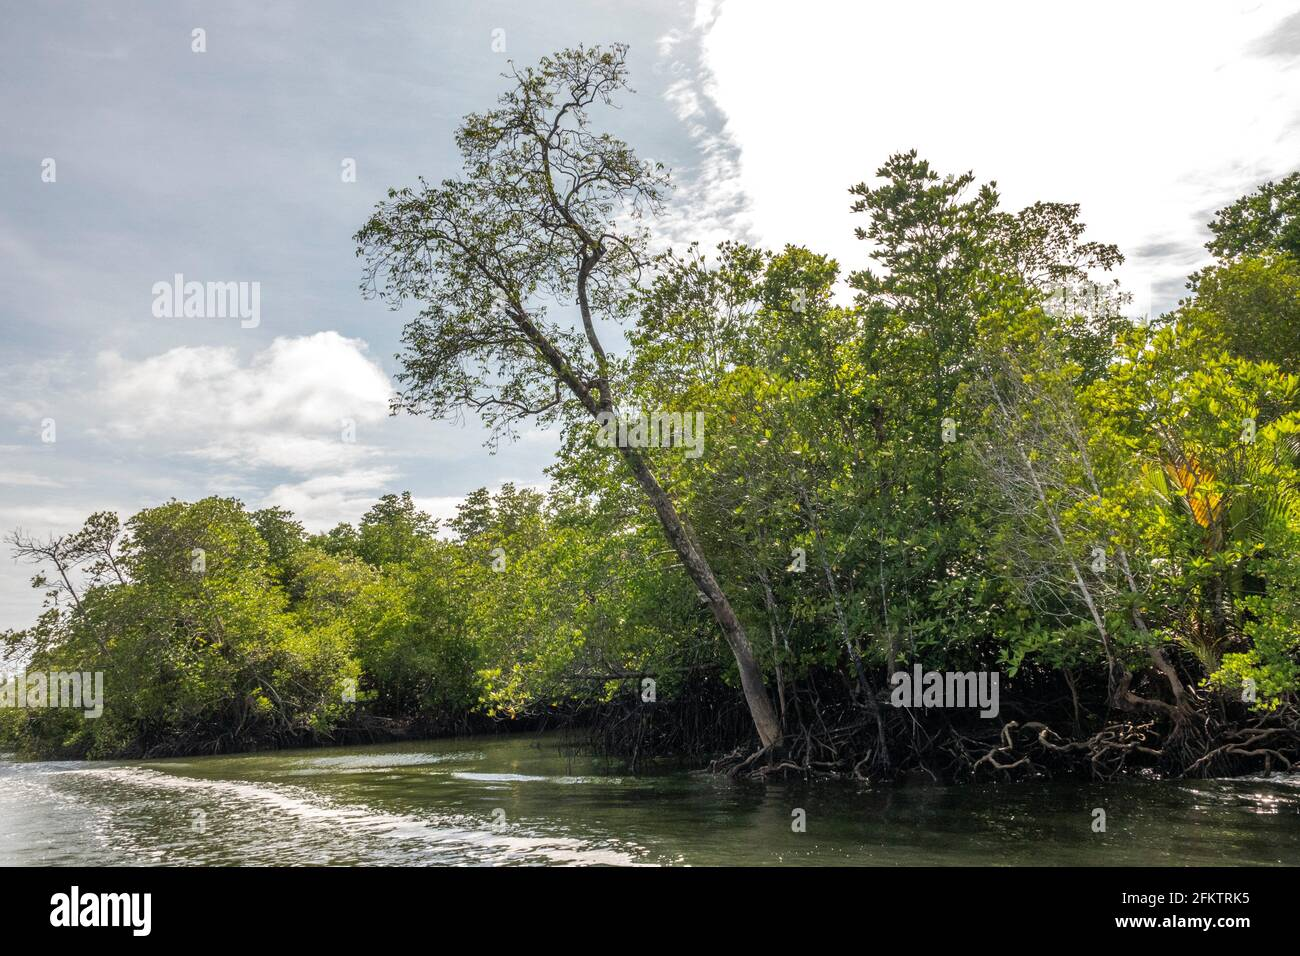 Crucero por la orilla del río Sibu Laut-Telaga Air, Matang, Sarawak, Malasia Foto de stock